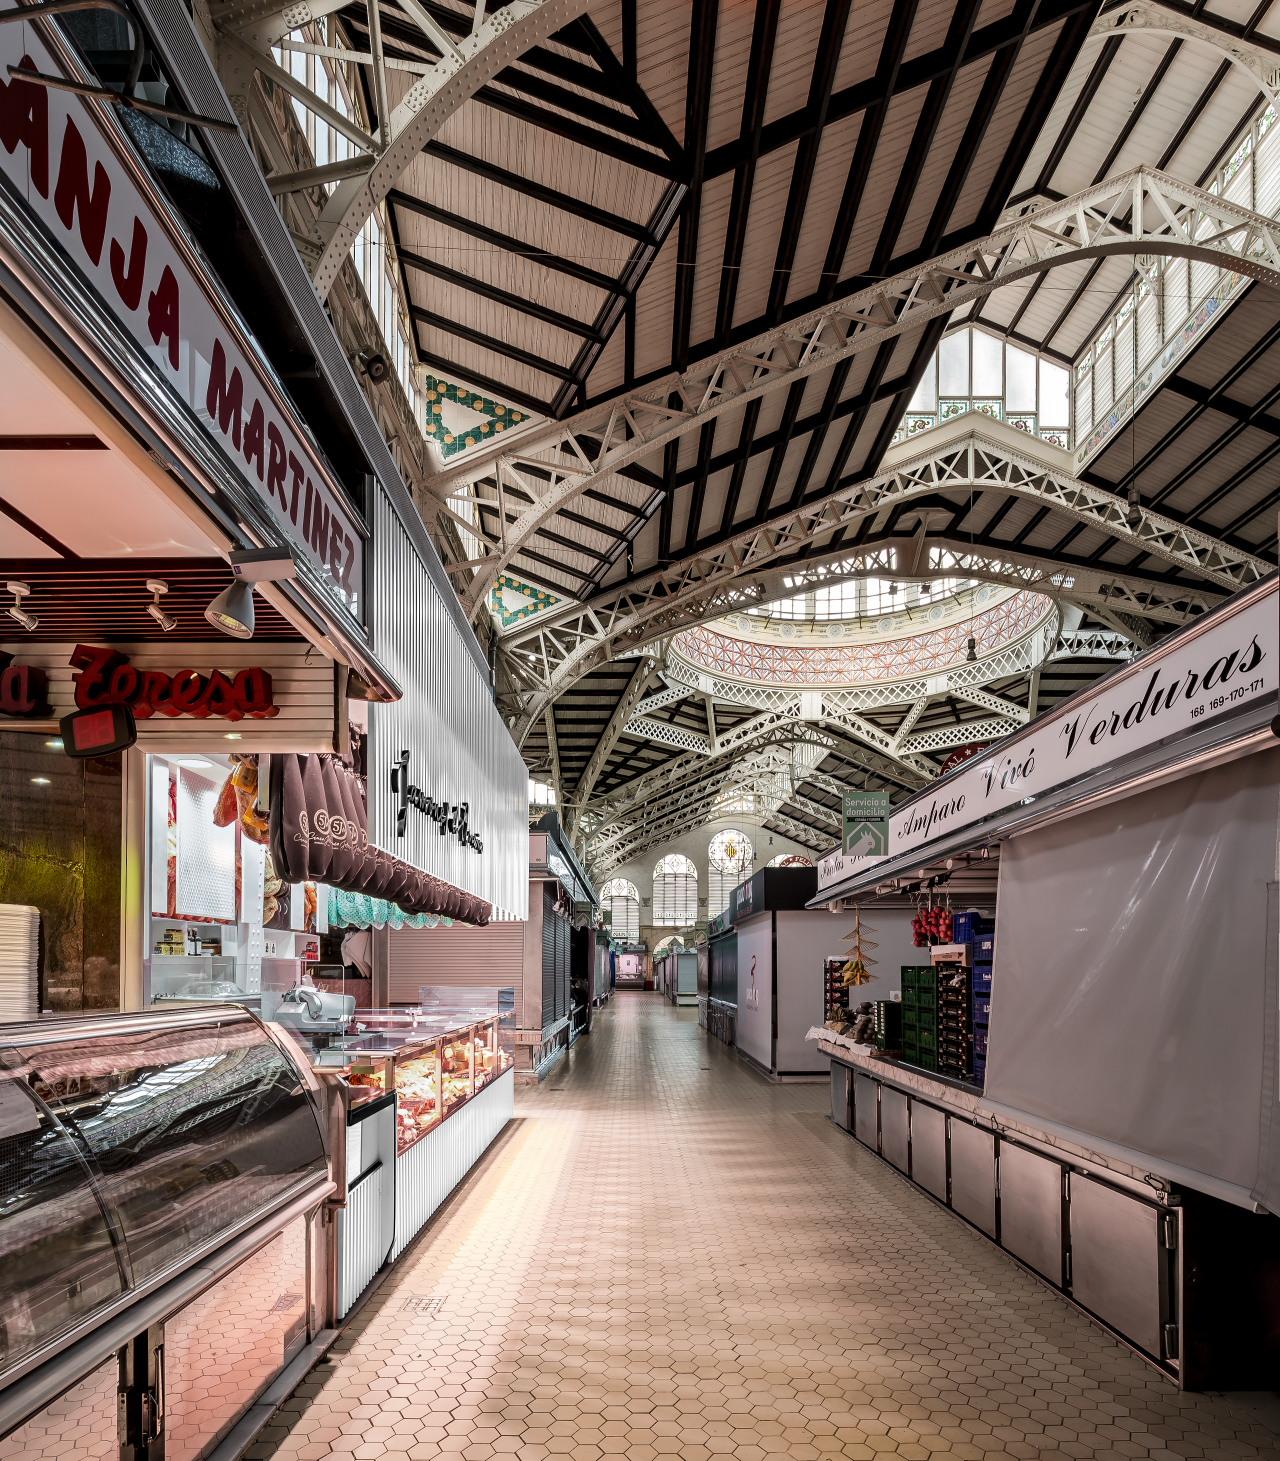 fotografia-arquitectura-valencia-german-cabo-lujan-mercado-central-jamones (9)